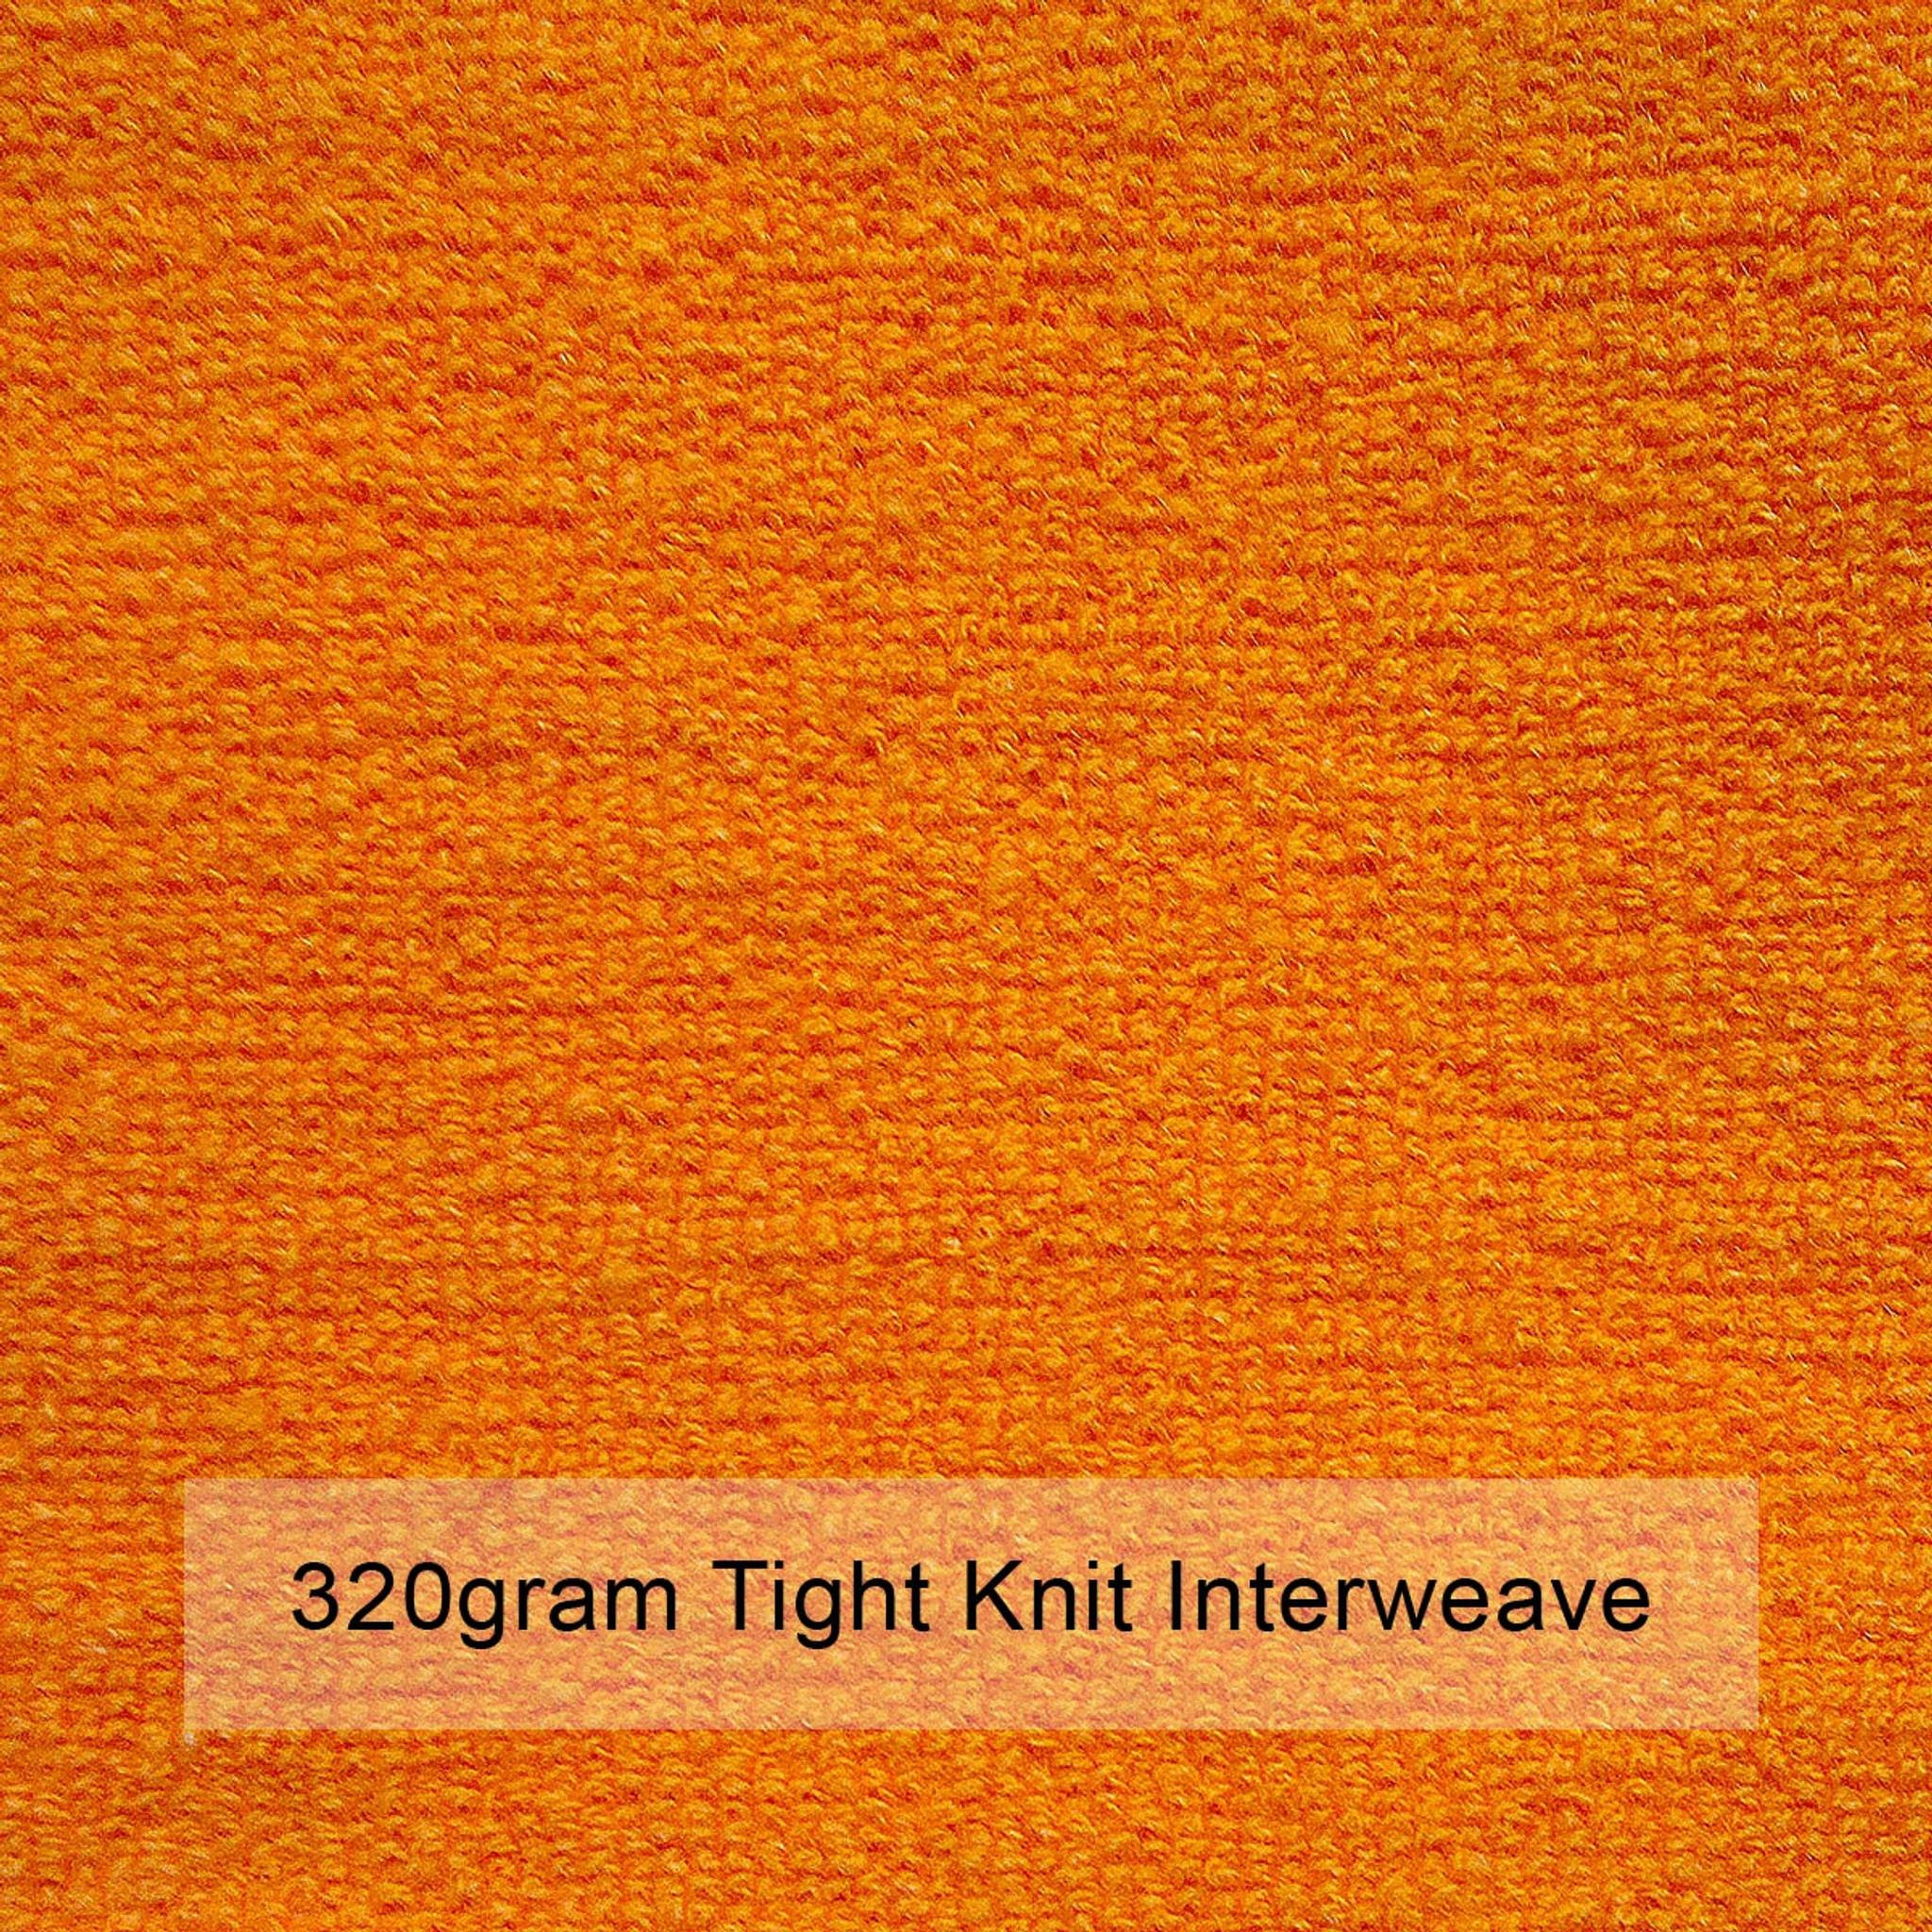 320gram Tight Knit Interweave